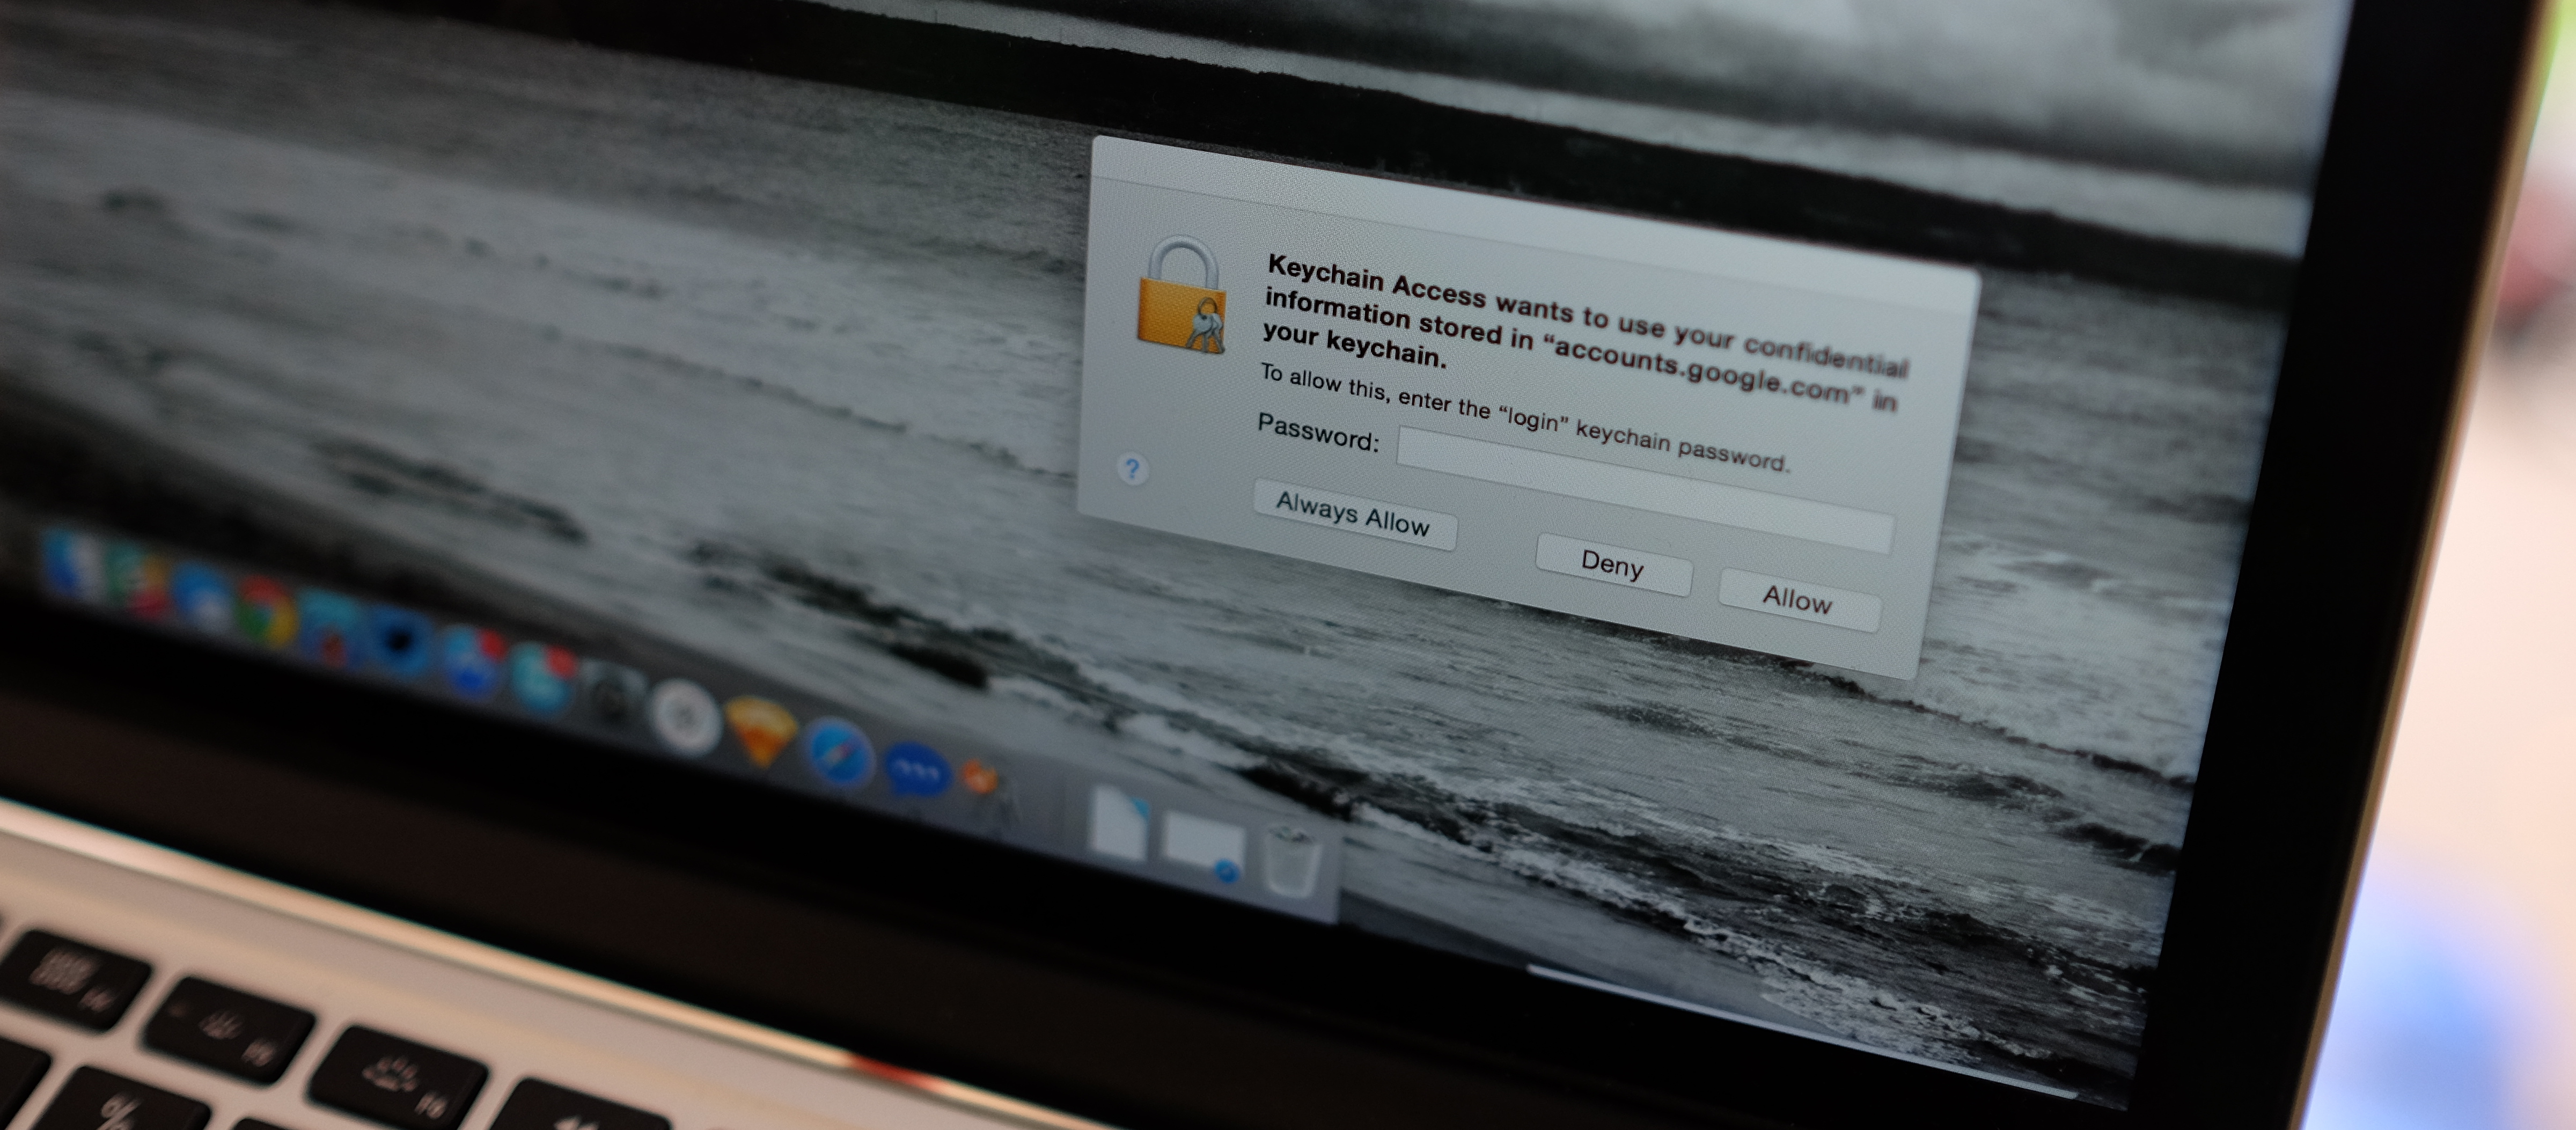 New OS X exploit breaks Keychain's security, exposes passwords